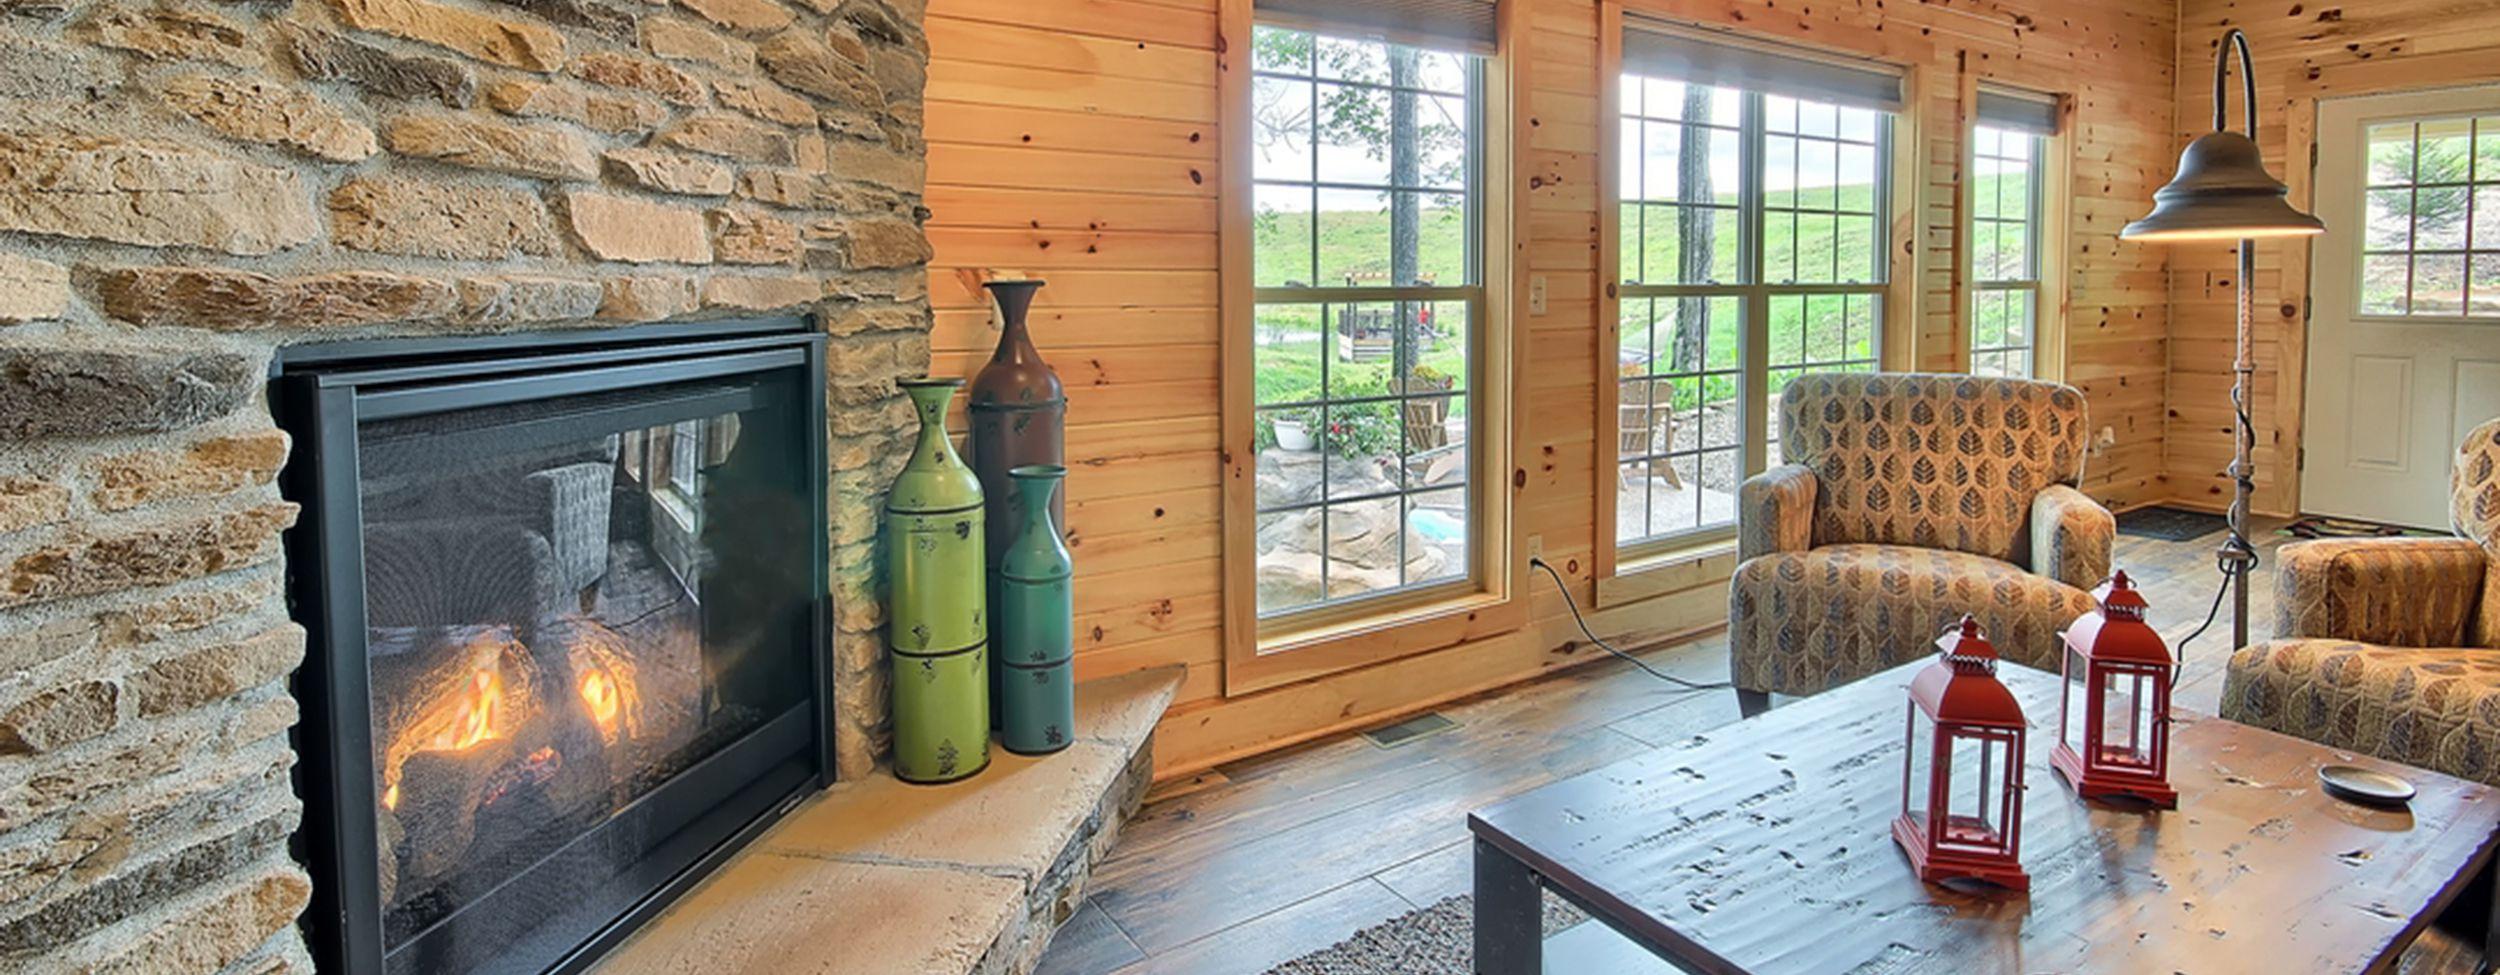 Interior Comforts Hocking Hills Luxury Lodge and Cabins